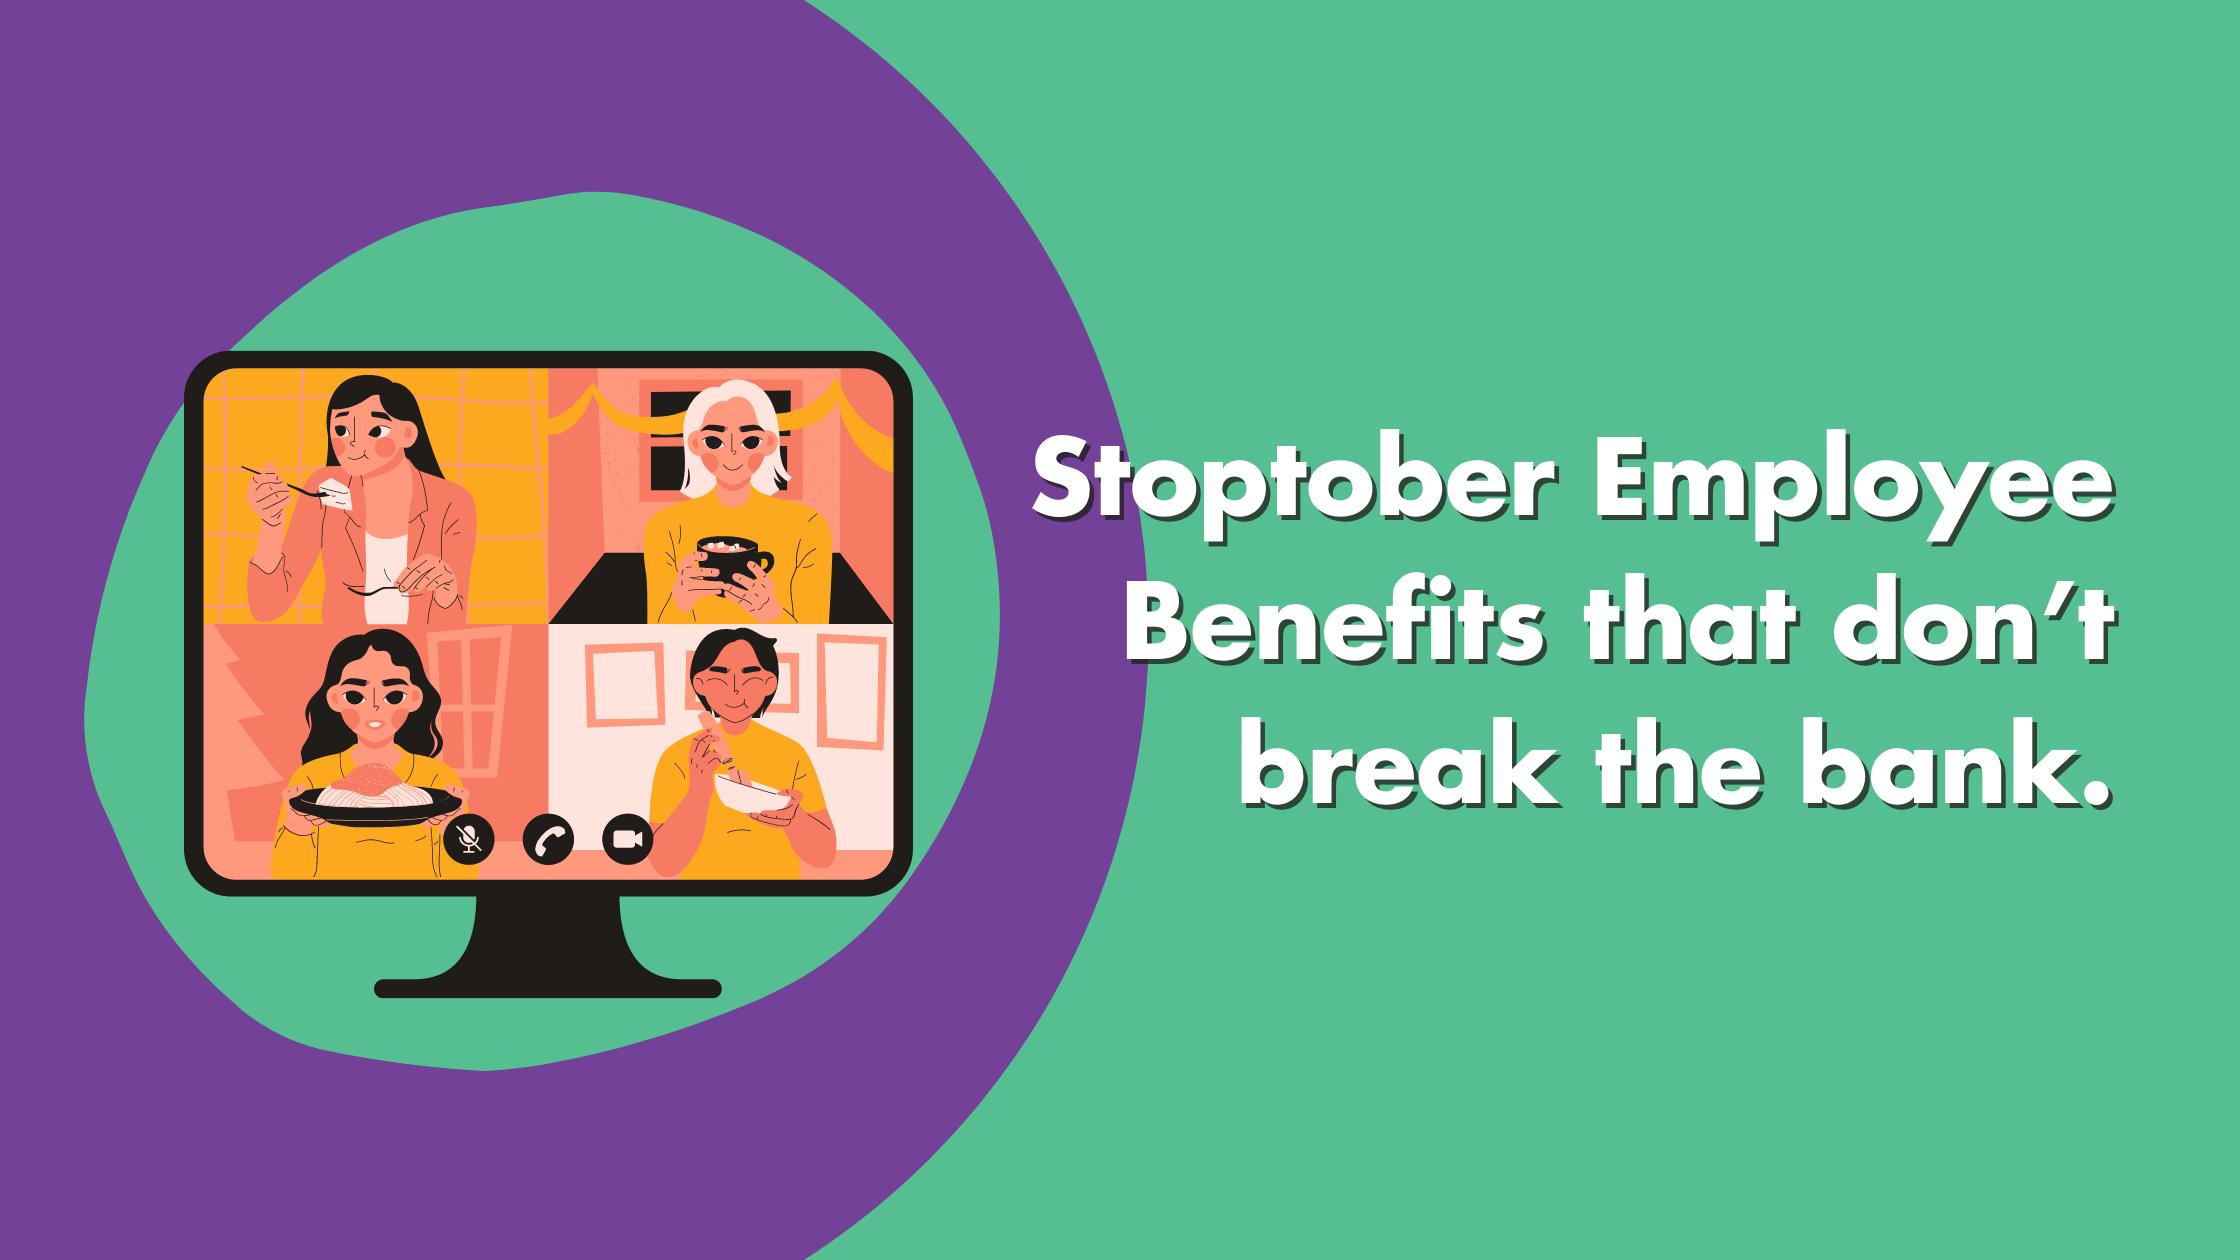 Stoptober Employee Benefits